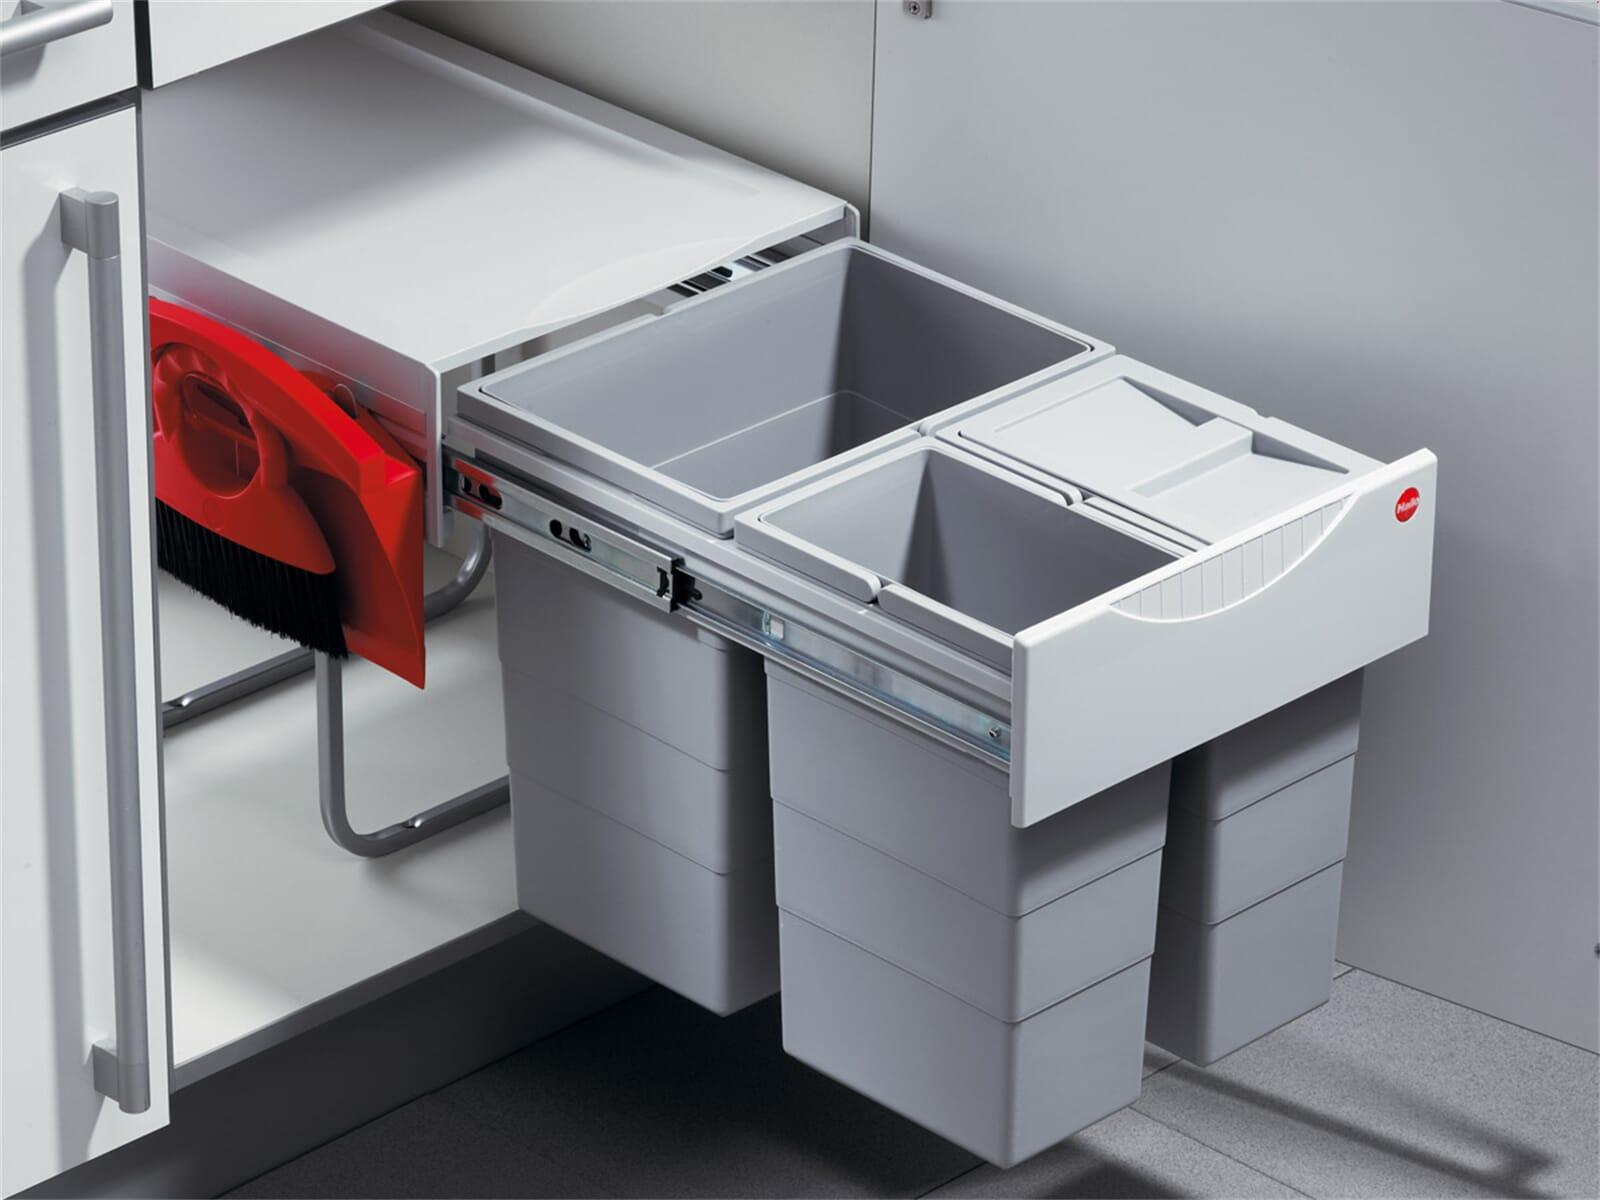 hailo raumspar tandem comfort 3642 23 einbau abfallsammler. Black Bedroom Furniture Sets. Home Design Ideas